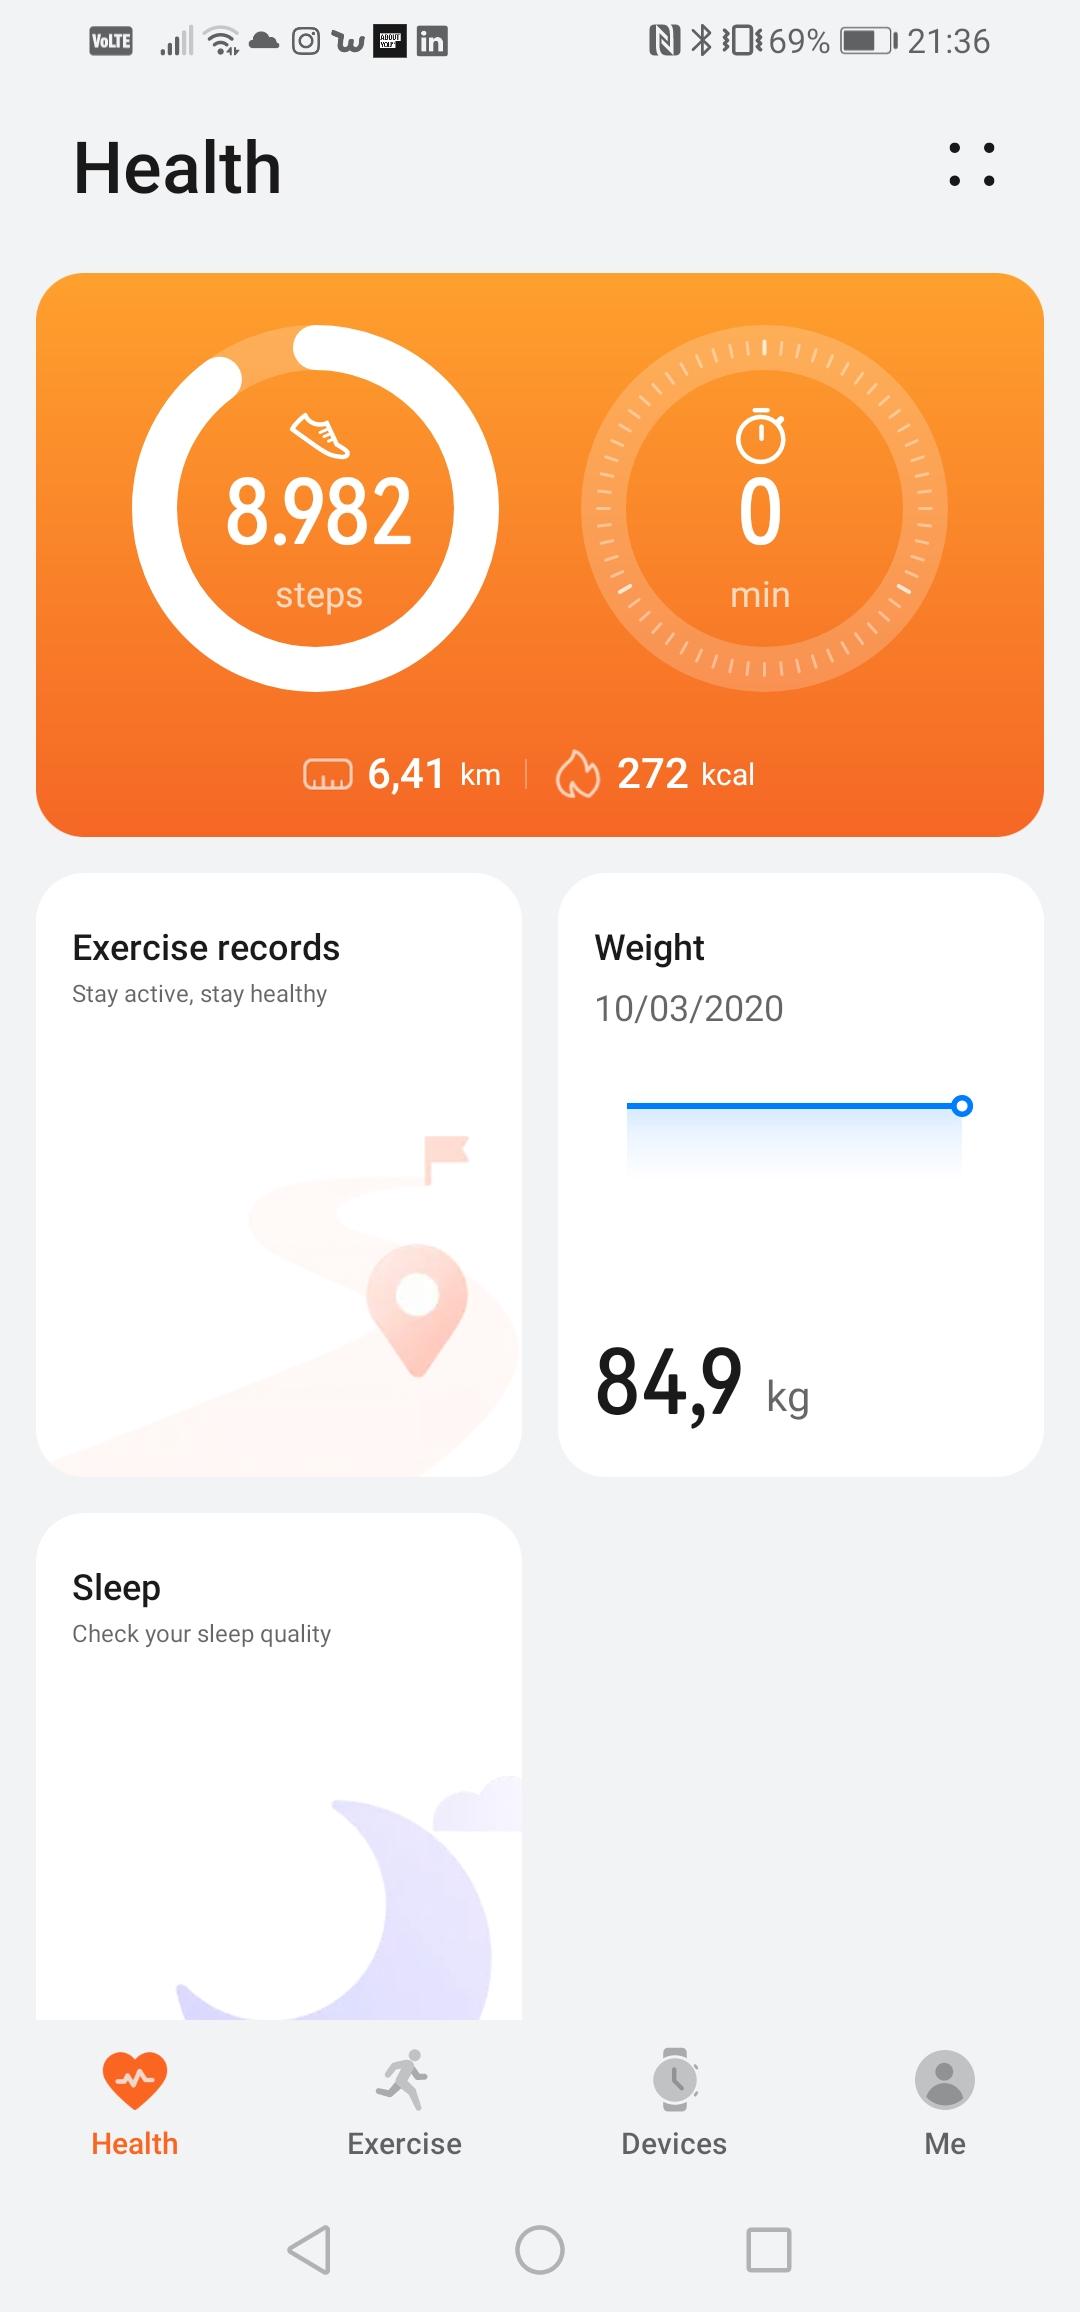 screenshot_20210514_213616_com-huawei-health